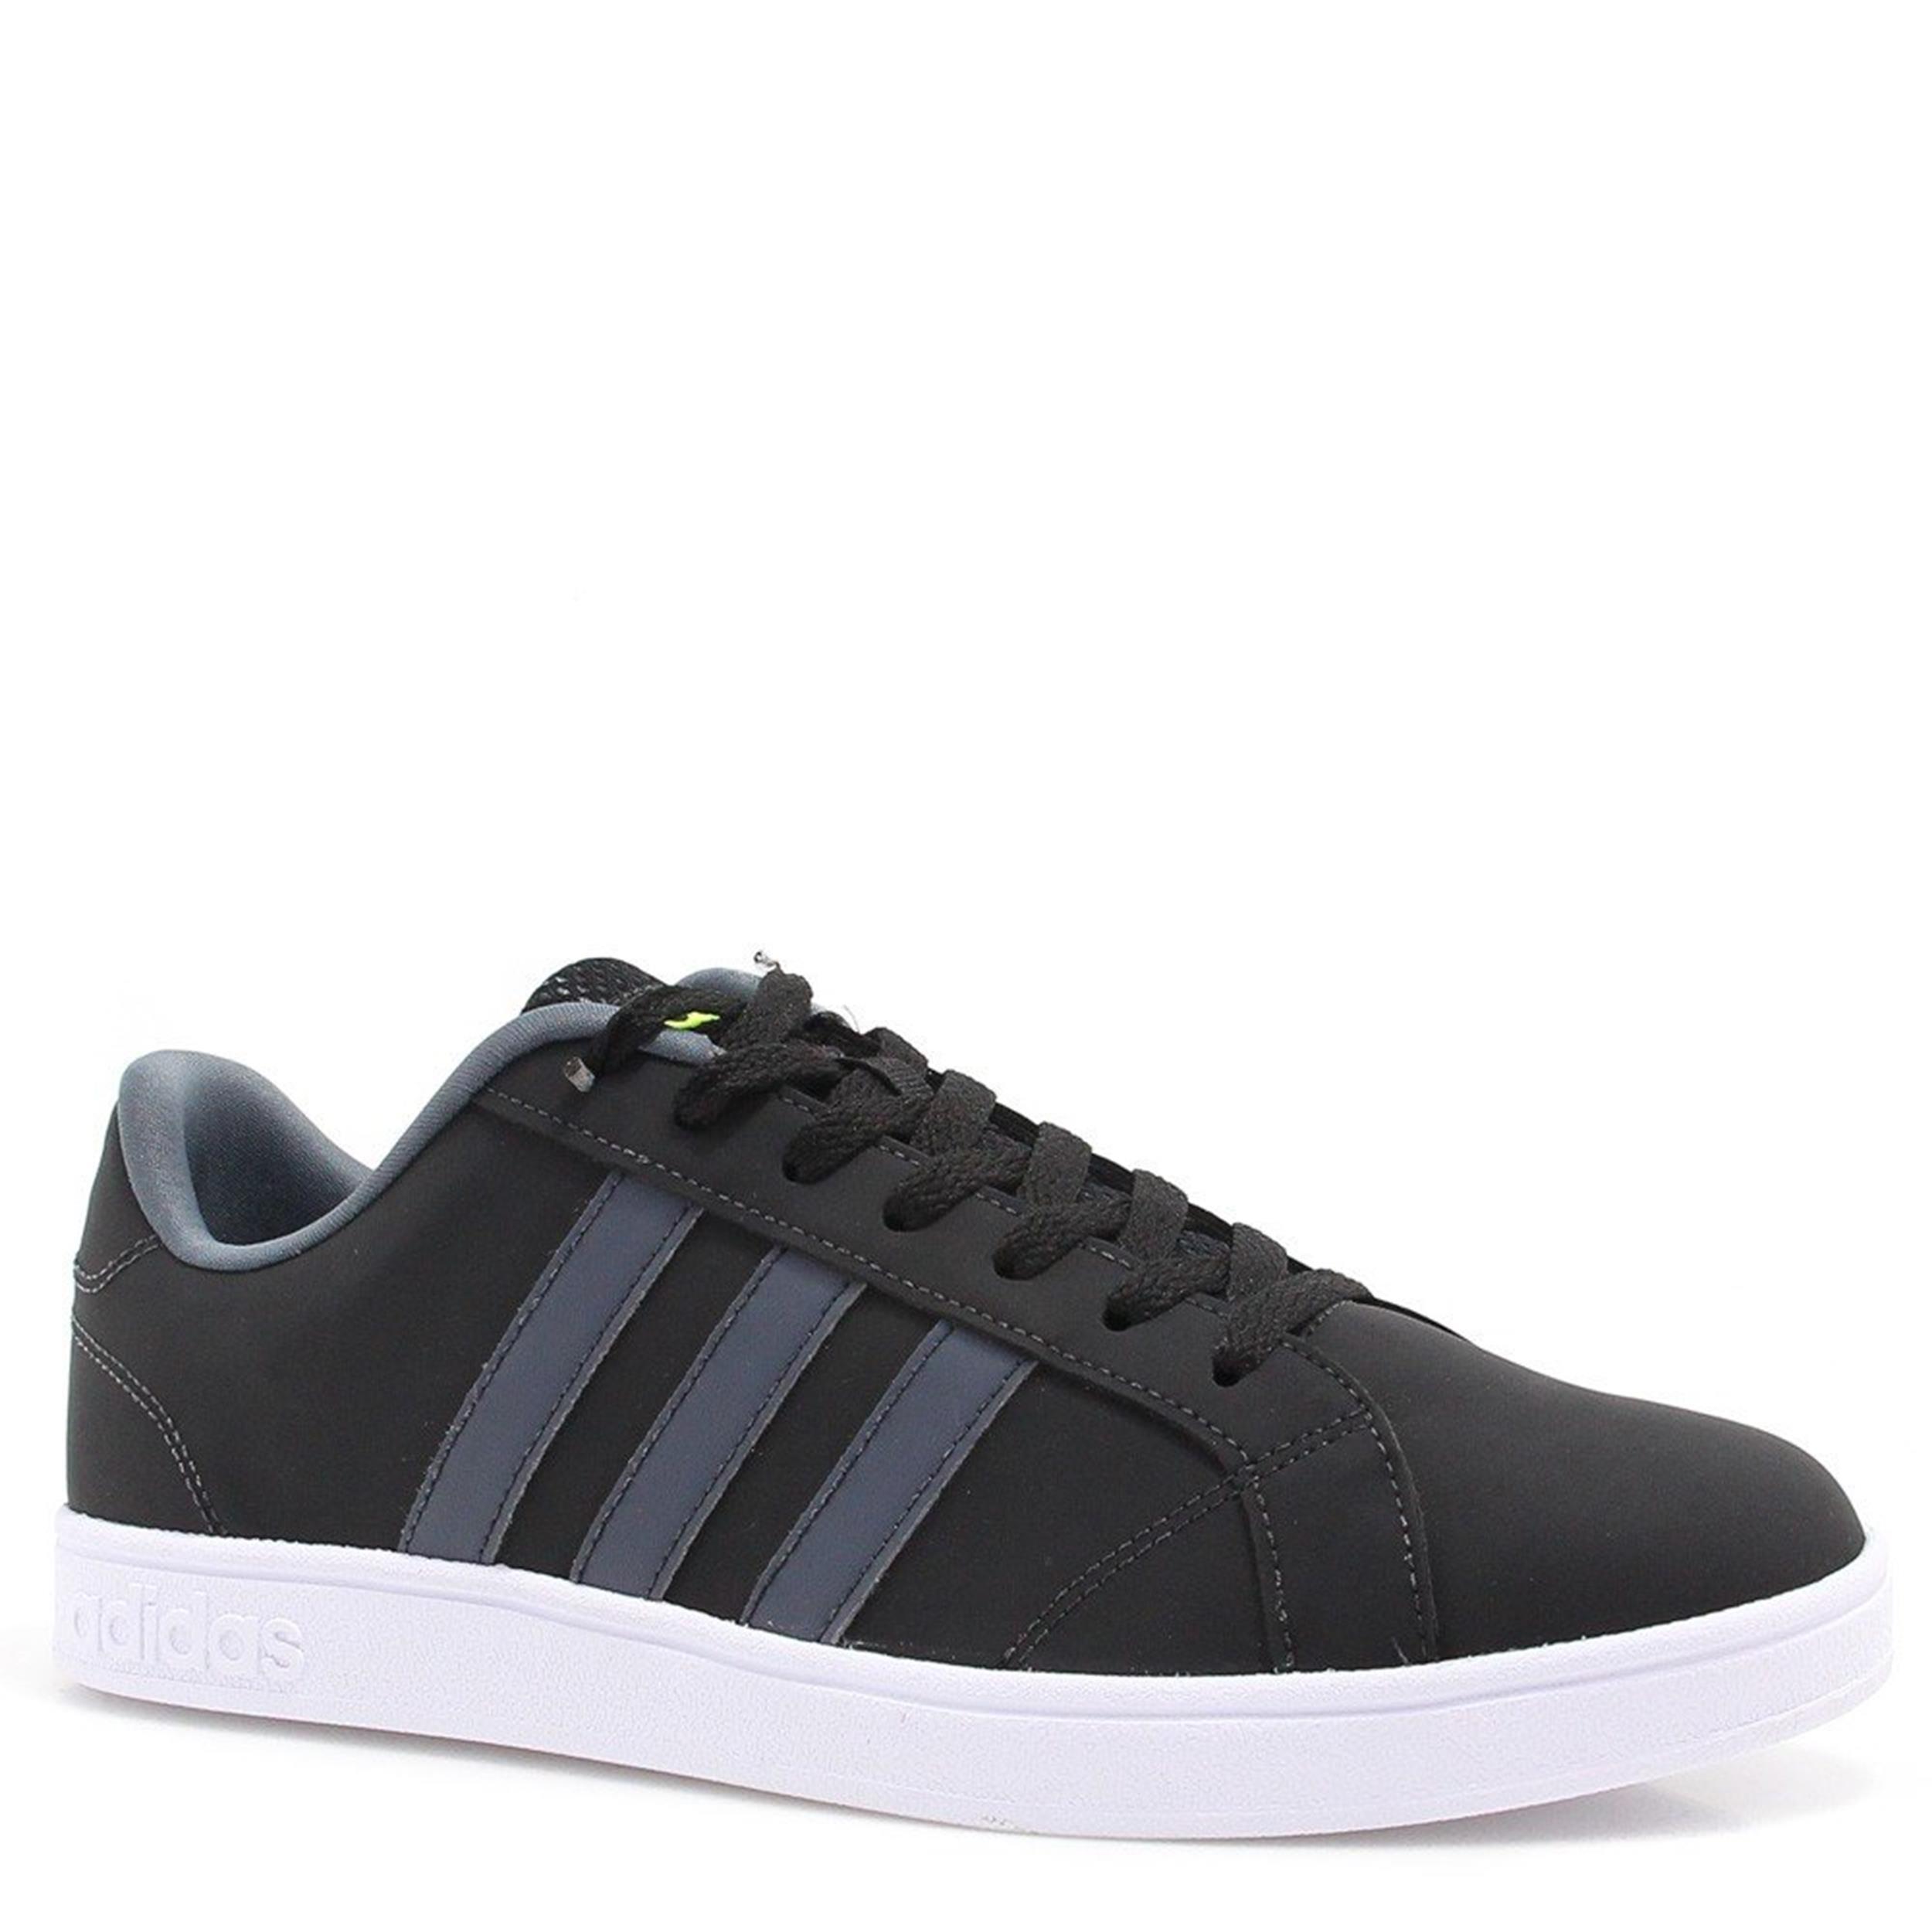 22bd9a46136 Tênis Adidas - Casuais e Esportivos